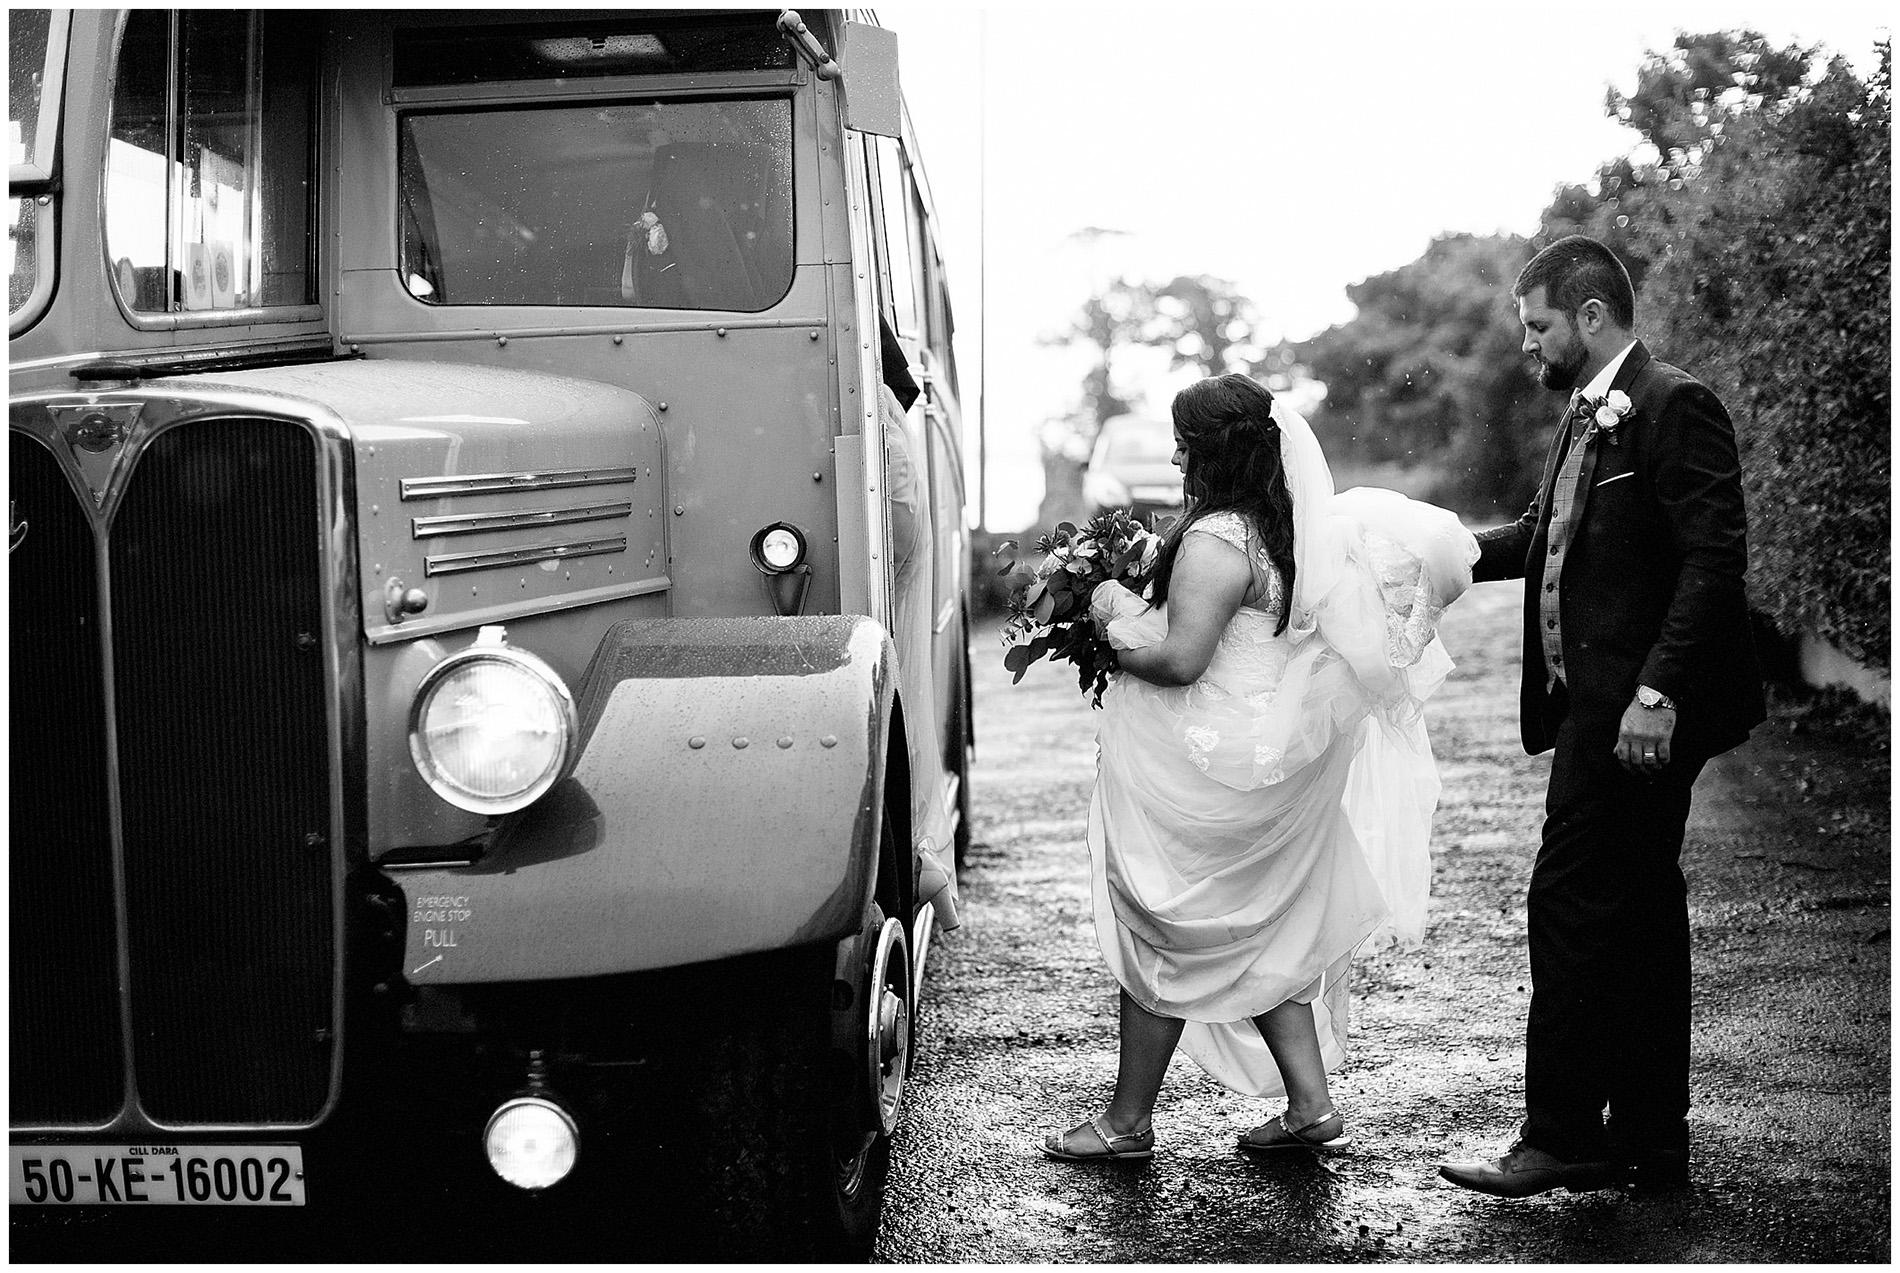 redcastle-hotel-wedding-karen-brian-jude-browne-photography-103.jpg